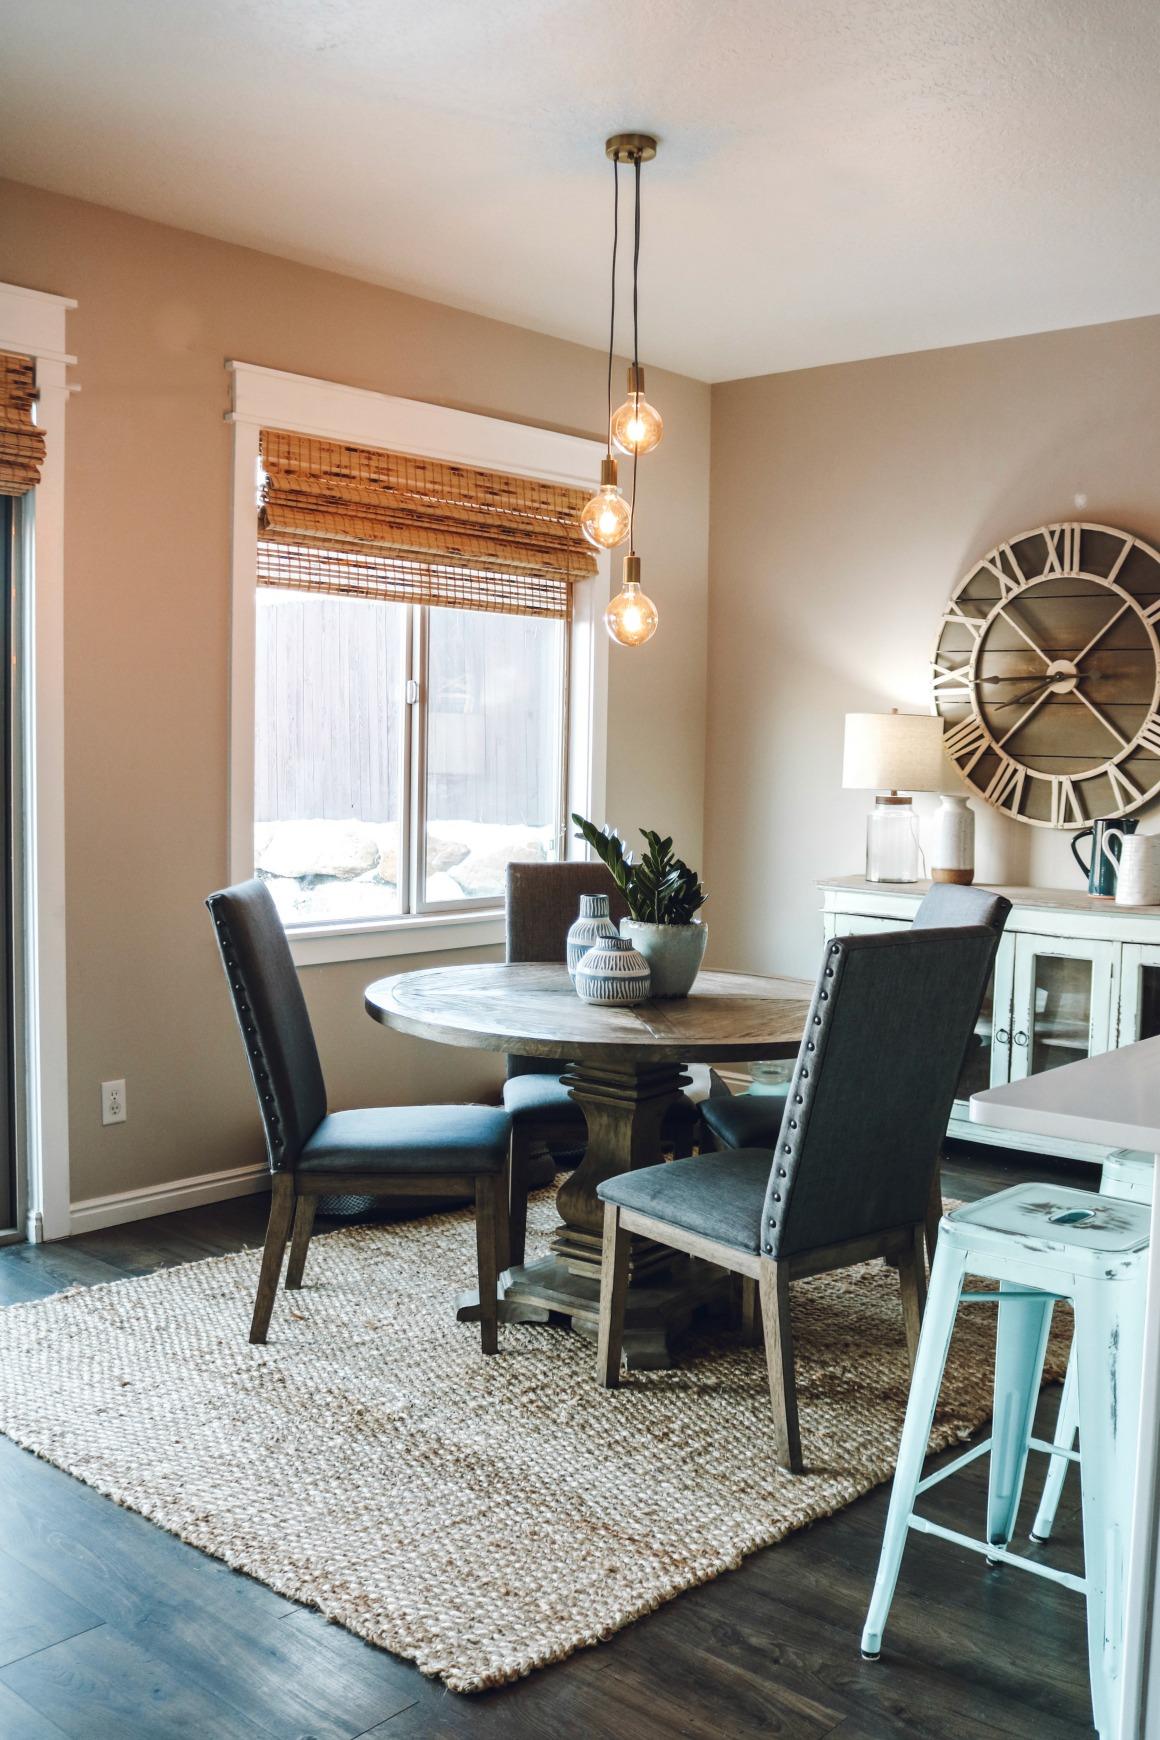 Family Room Makeover- Decorating around a TV